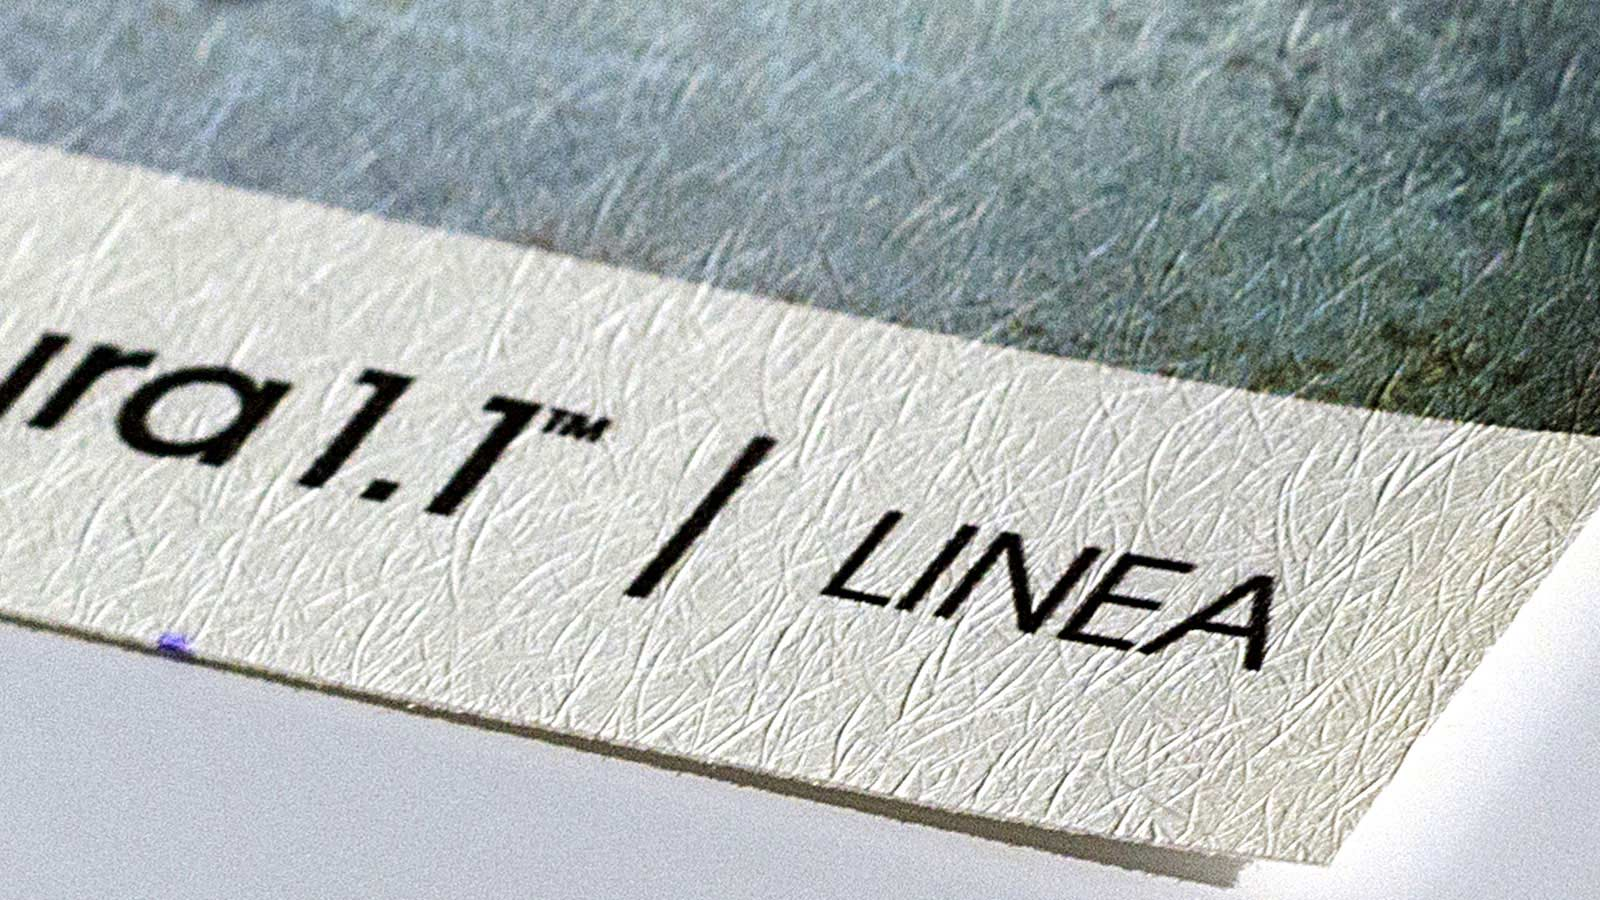 Detalle Linea